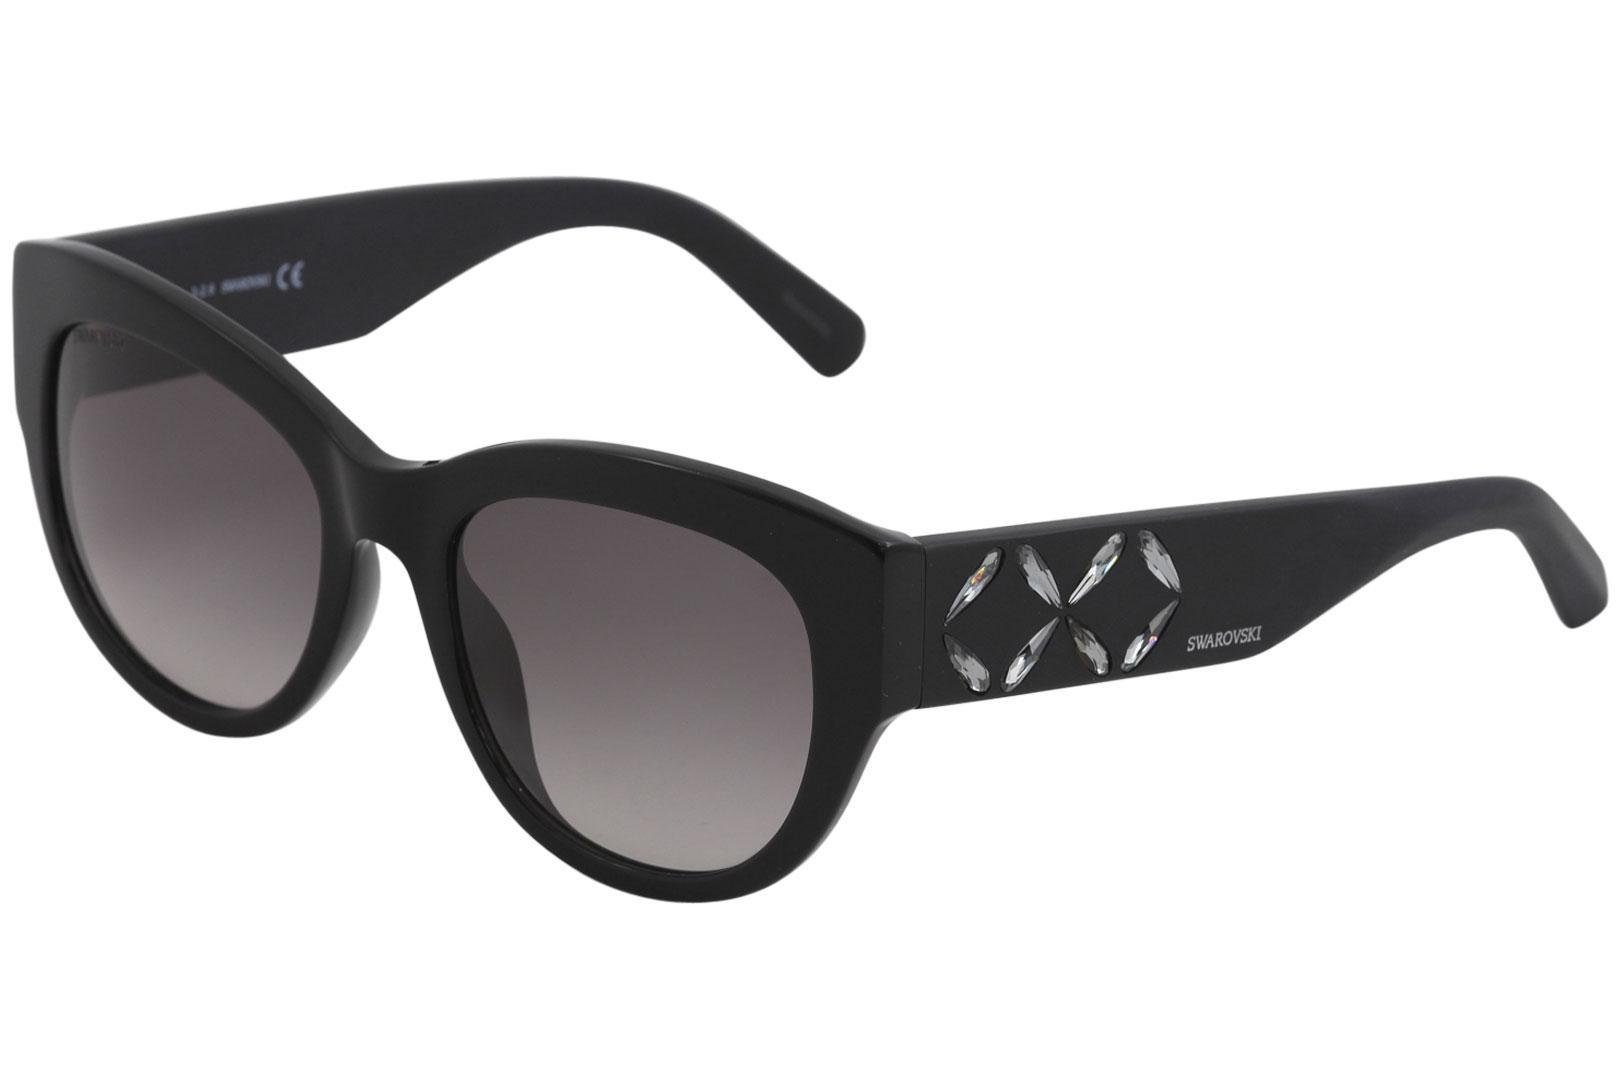 Image of Swarovski Women's SK0127 SK/0127 Fashion Square Sunglasses - Black - Lens 54 Bridge 19 Temple 140mm